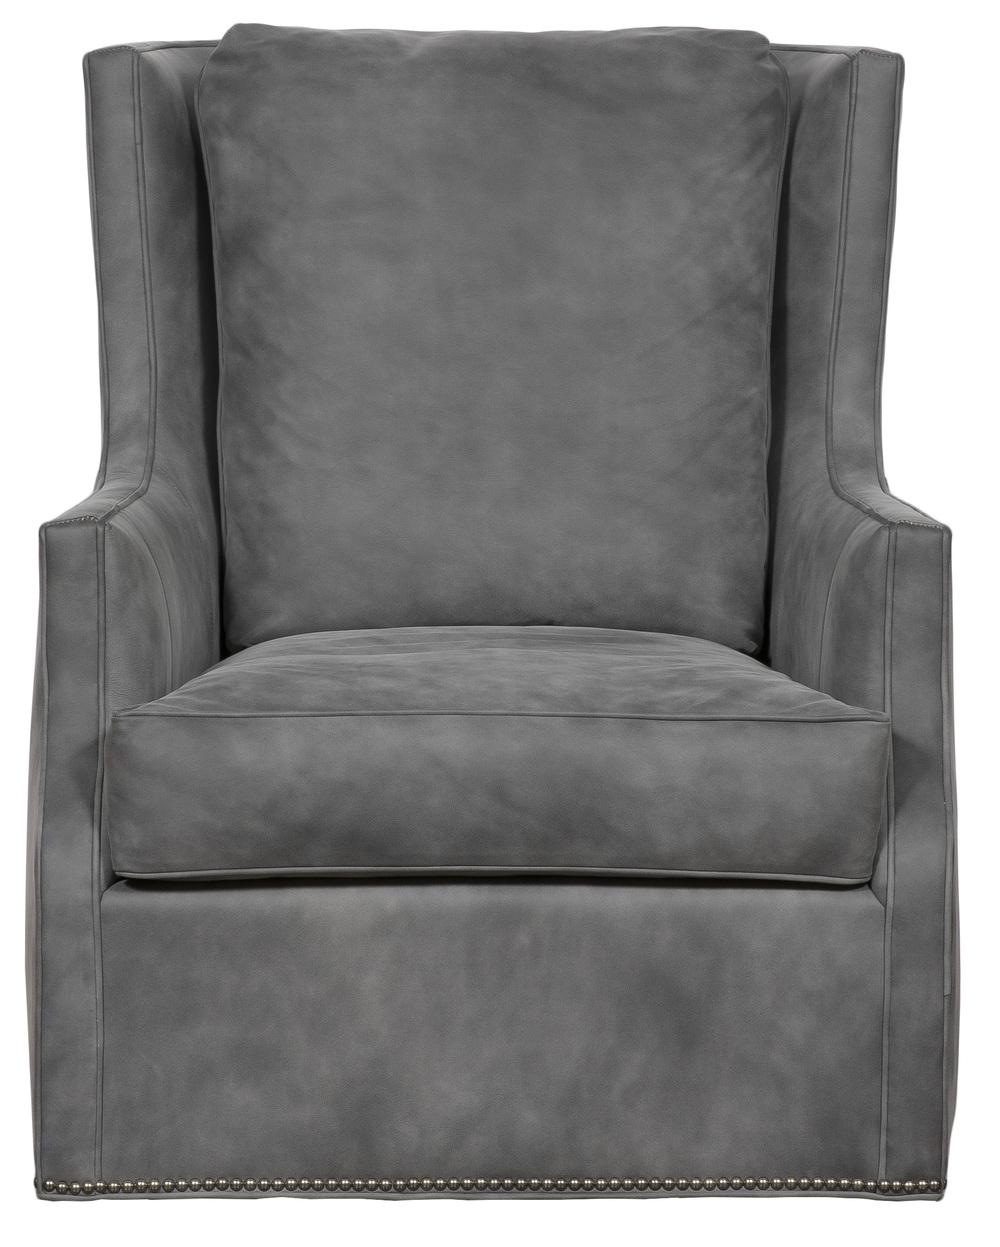 Vanguard Furniture - Merrill Base to Floor Swivel Chair